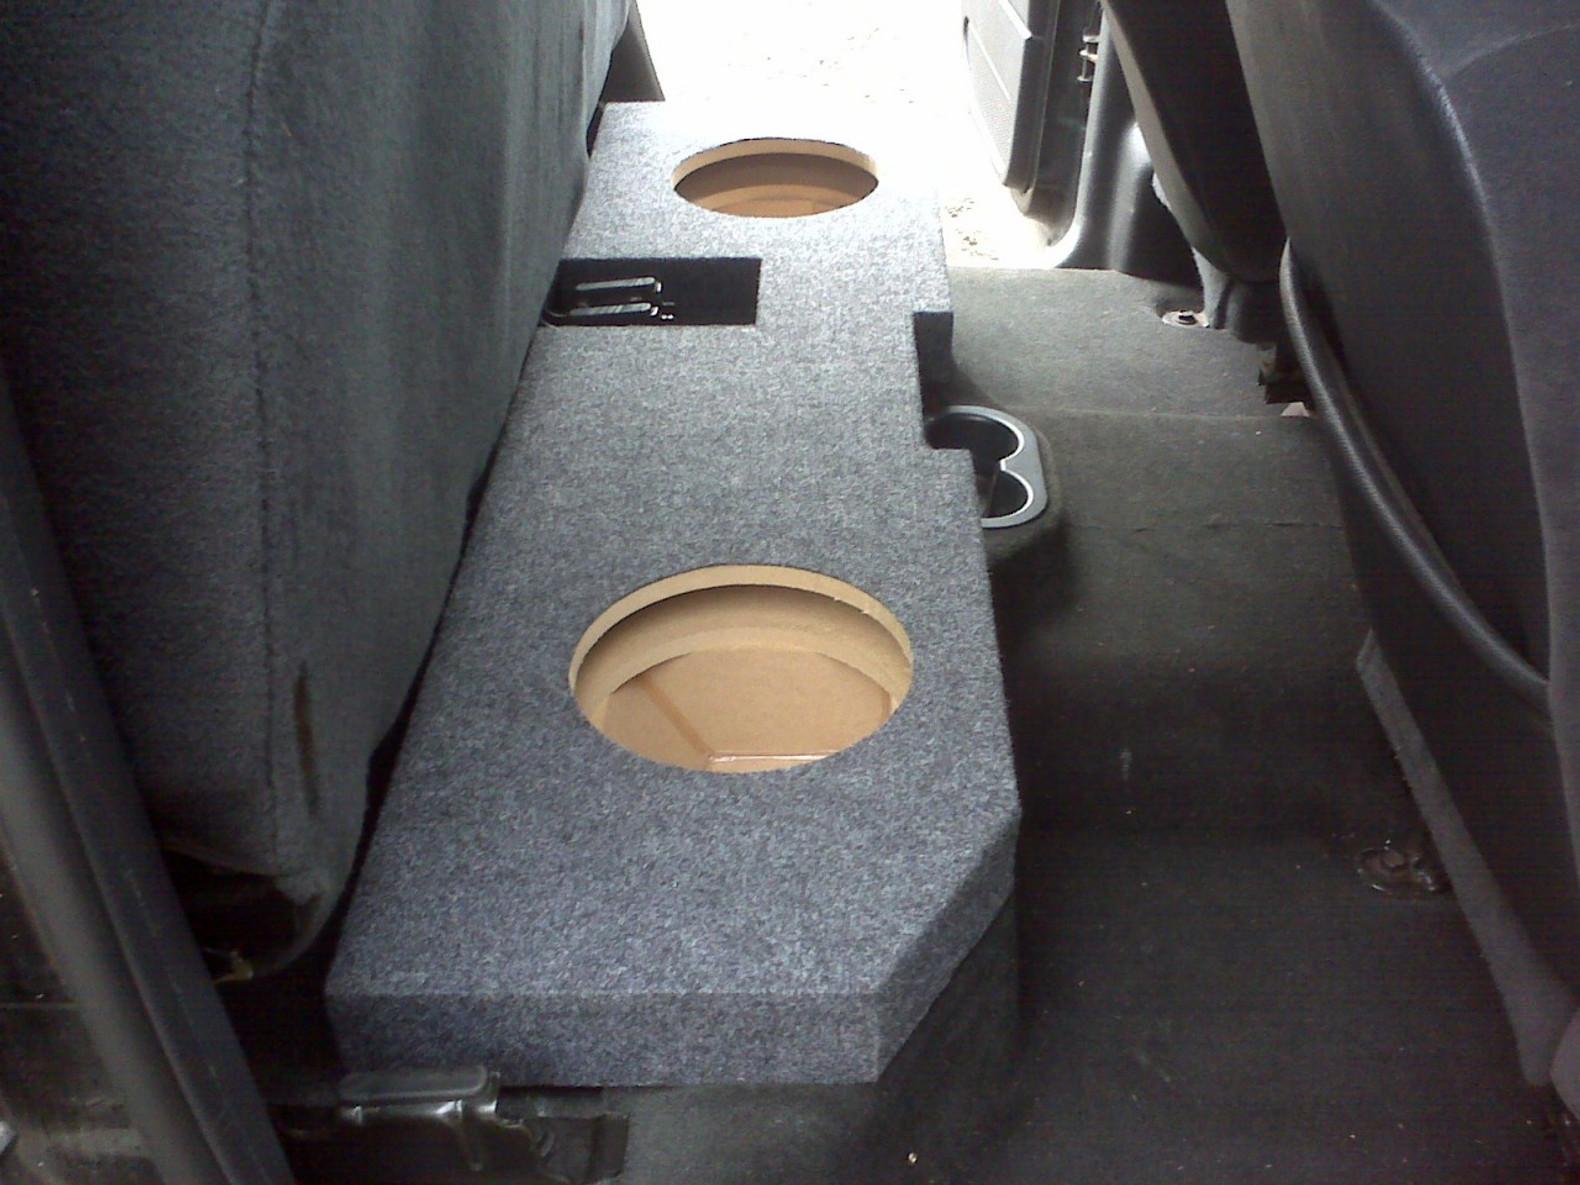 2002 To 2018 Dodge Ram Quad And Crew Cab Truck Dual Sub Box Ssa Store